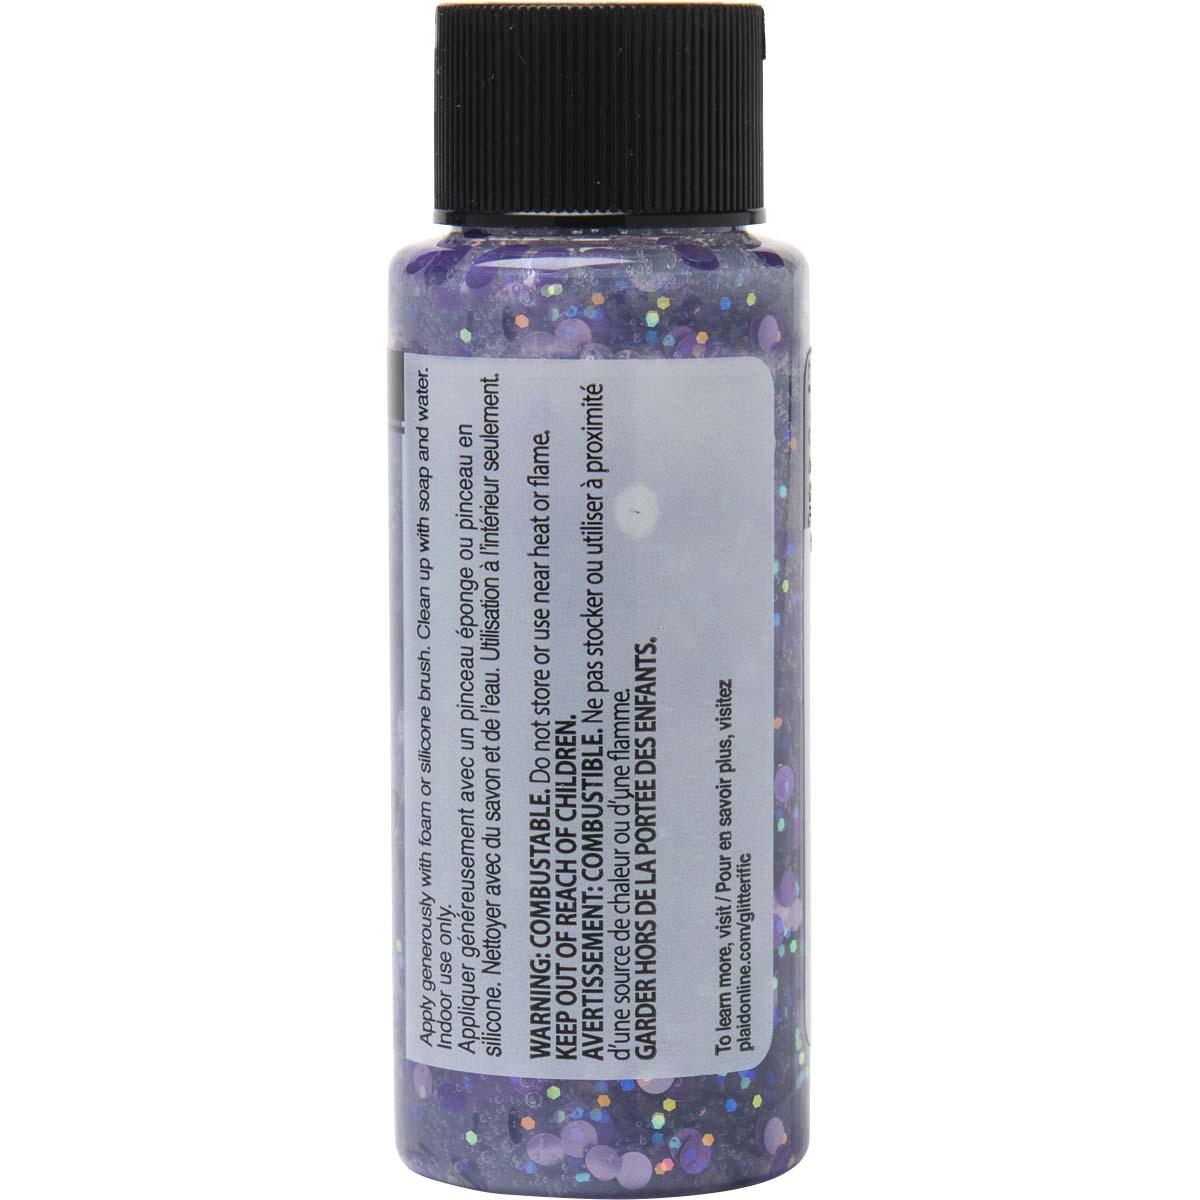 FolkArt ® Glitterific™ Polka Dot Acrylic Paint - Lavender, 2 oz. - 7192